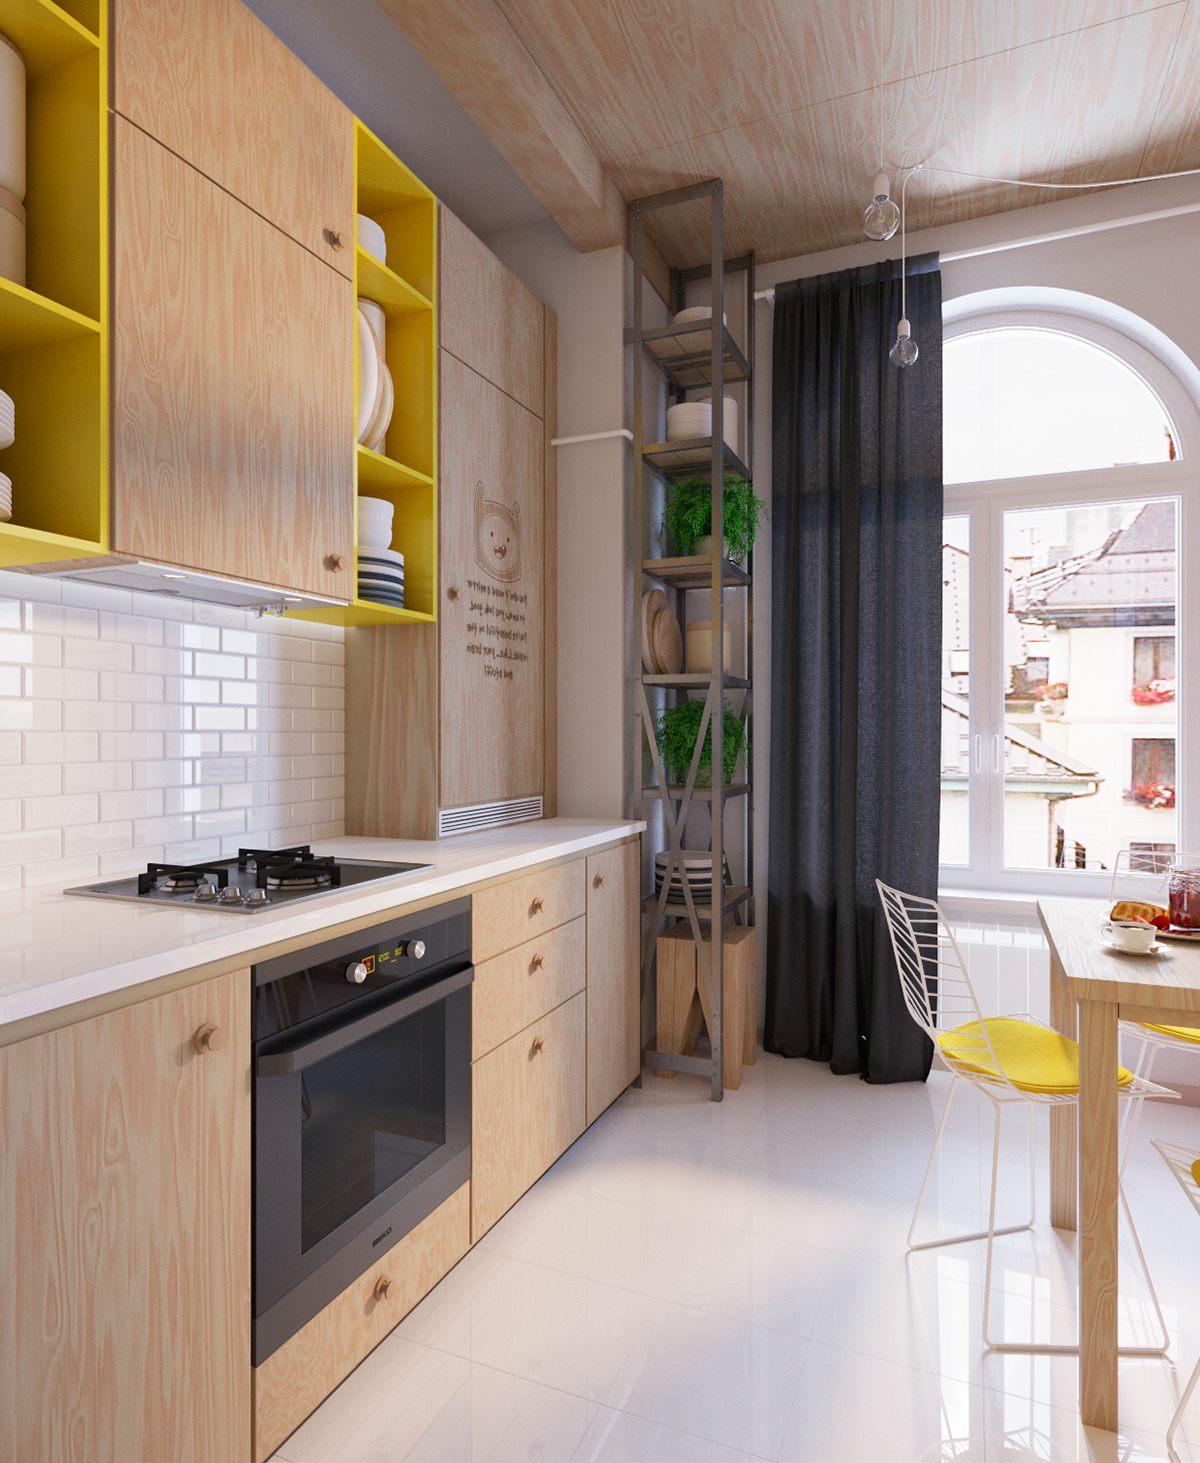 modern-yellow-kitchen-decor